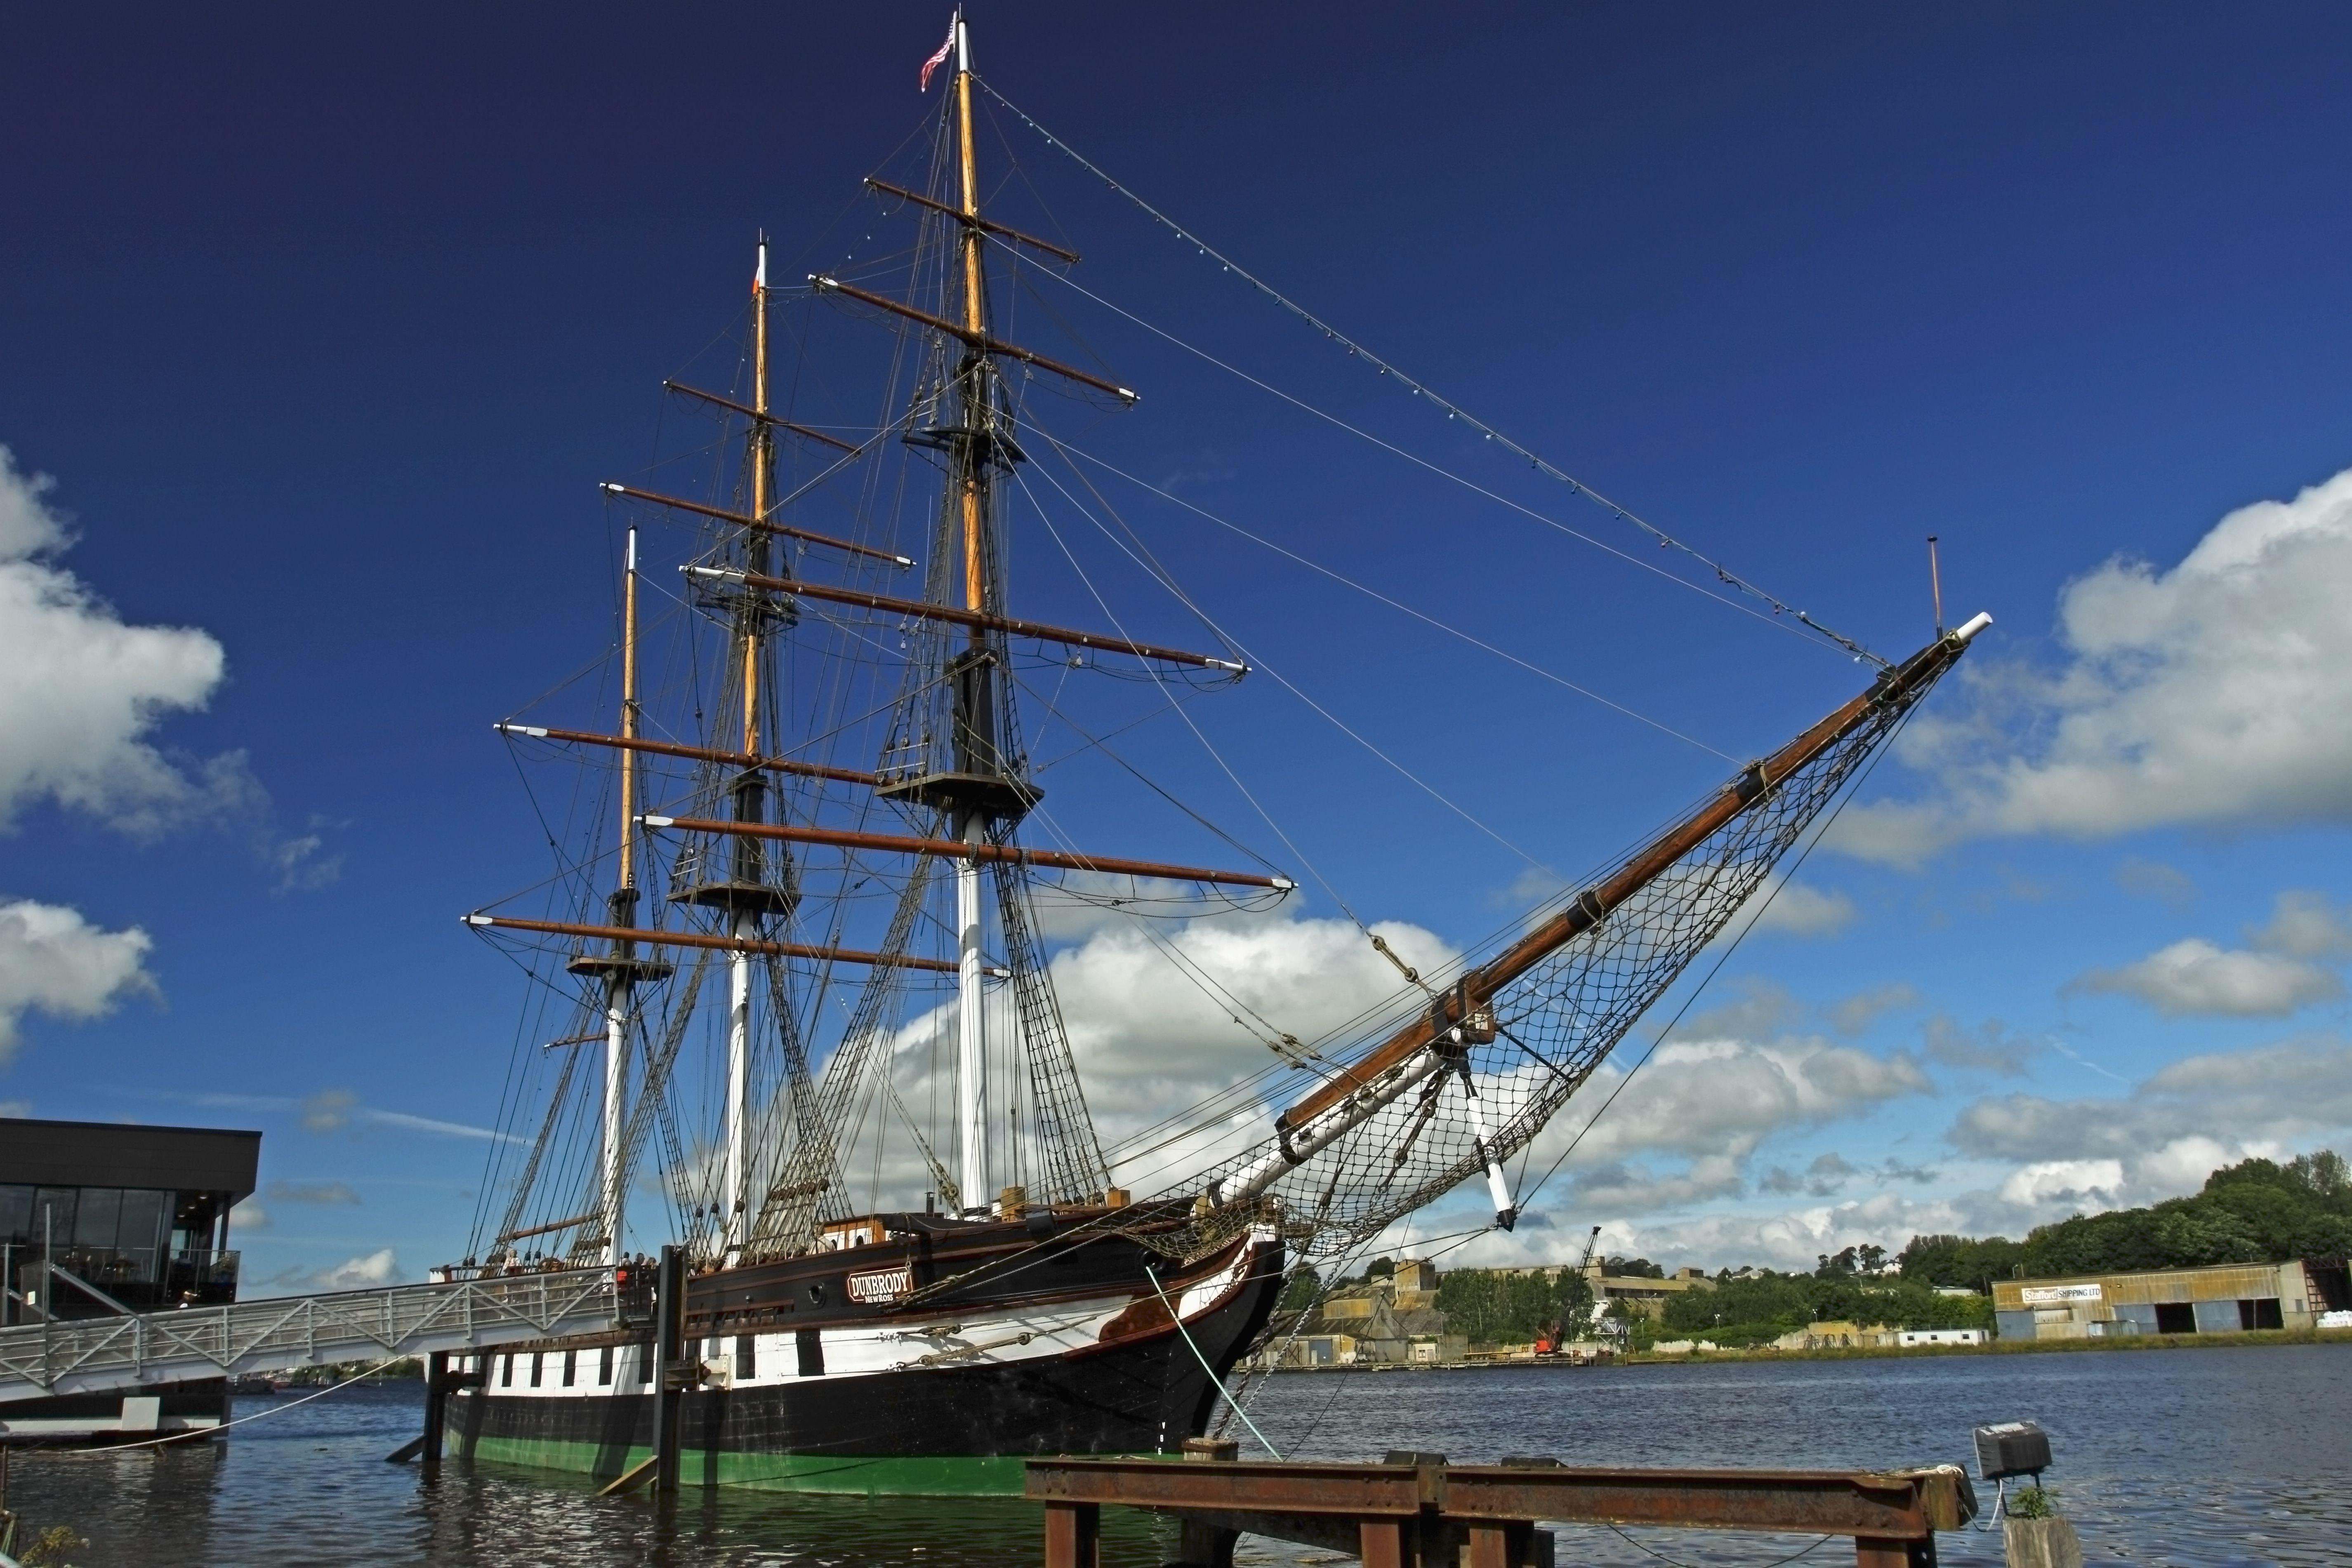 Dunbrody Famine Ship